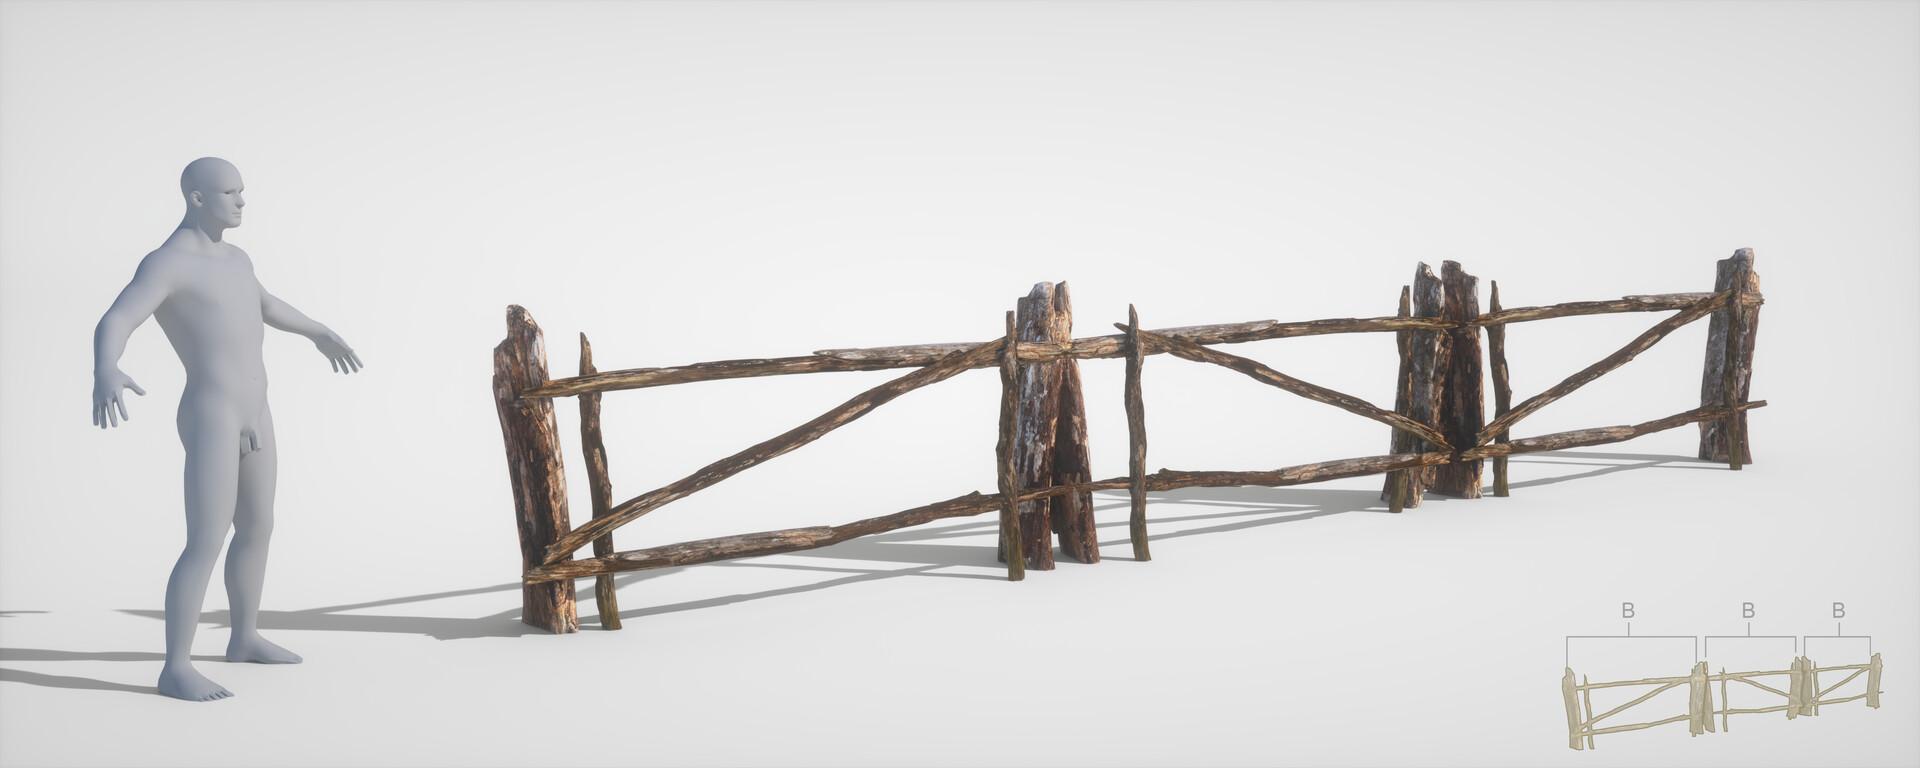 Jordi van hees fence